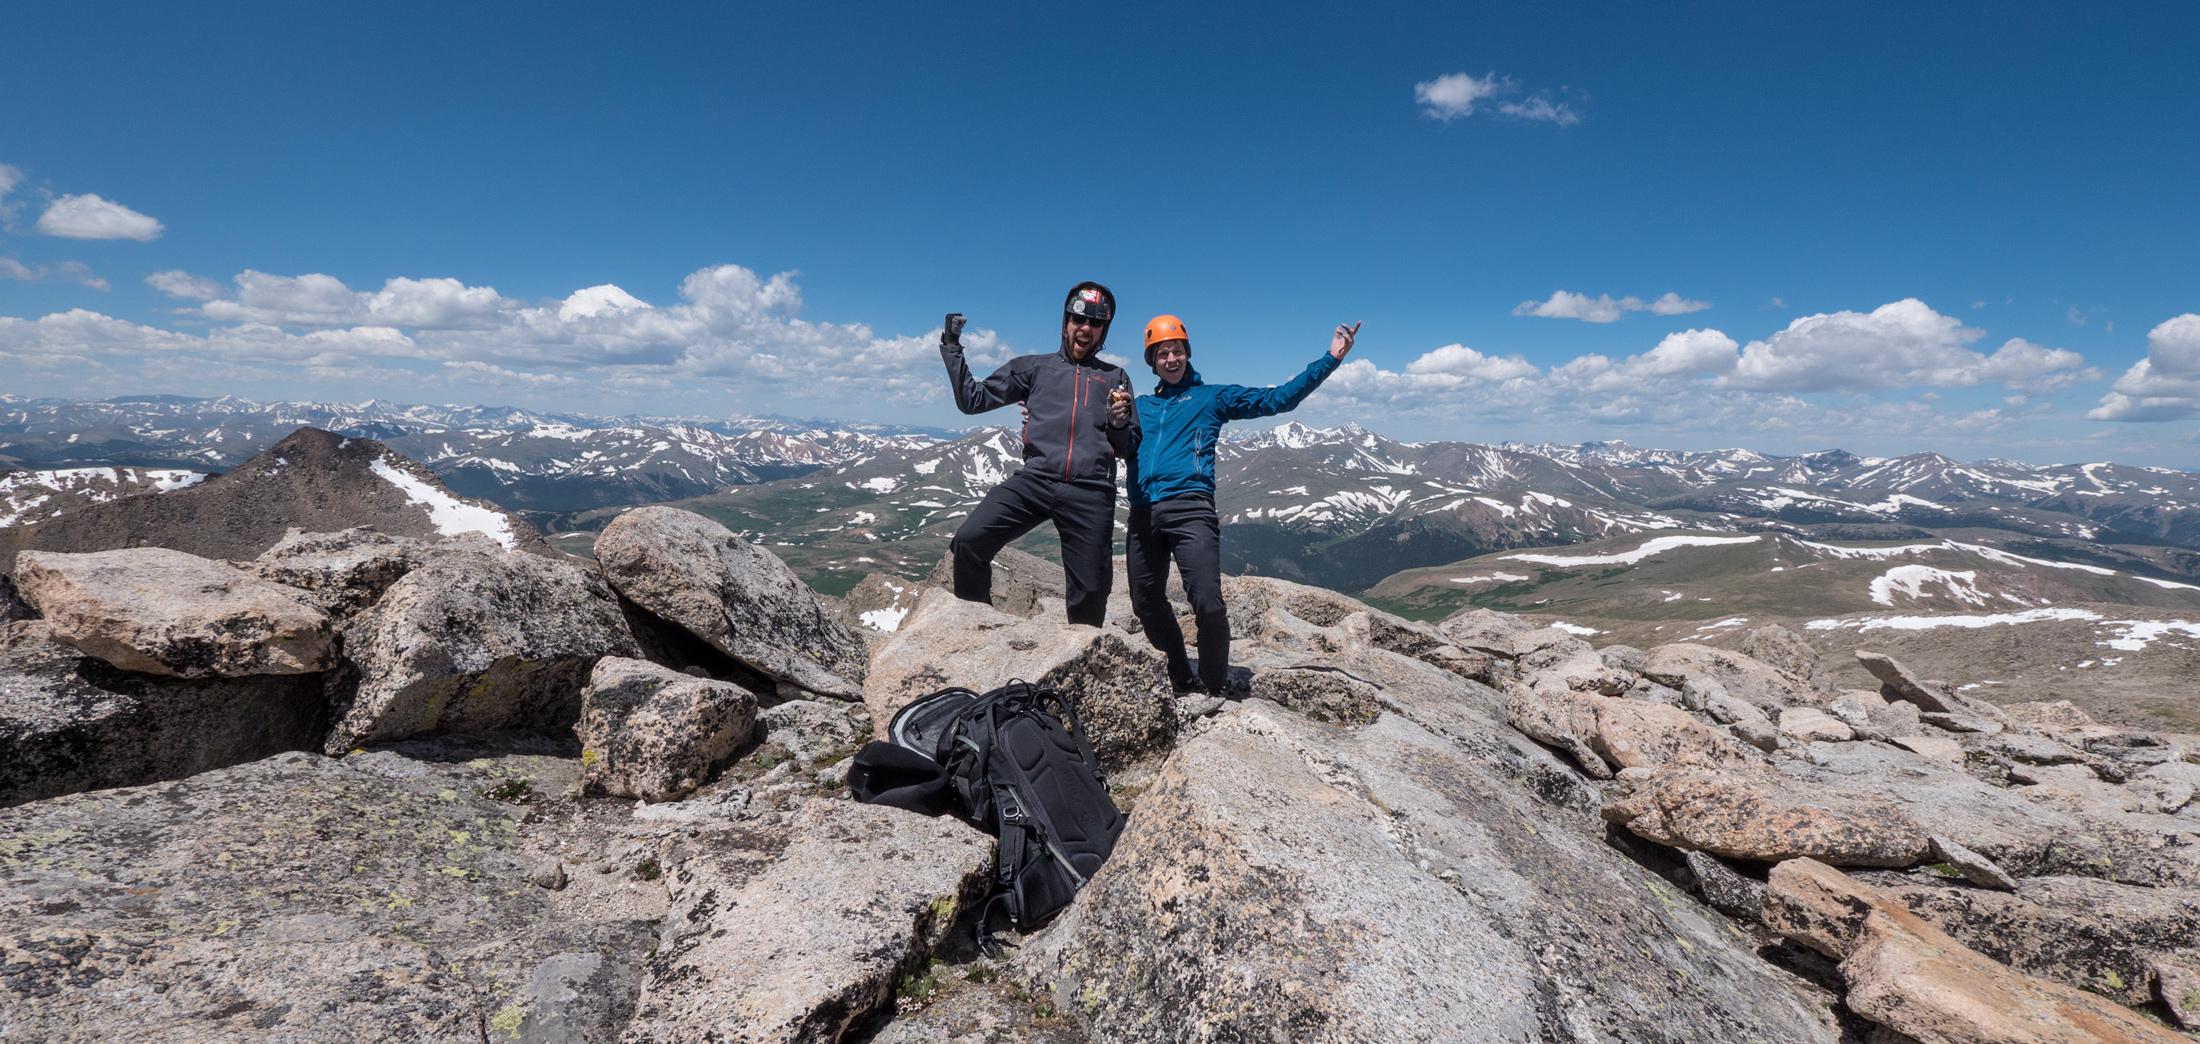 colorado-climbing-2017-1030500-web.jpg